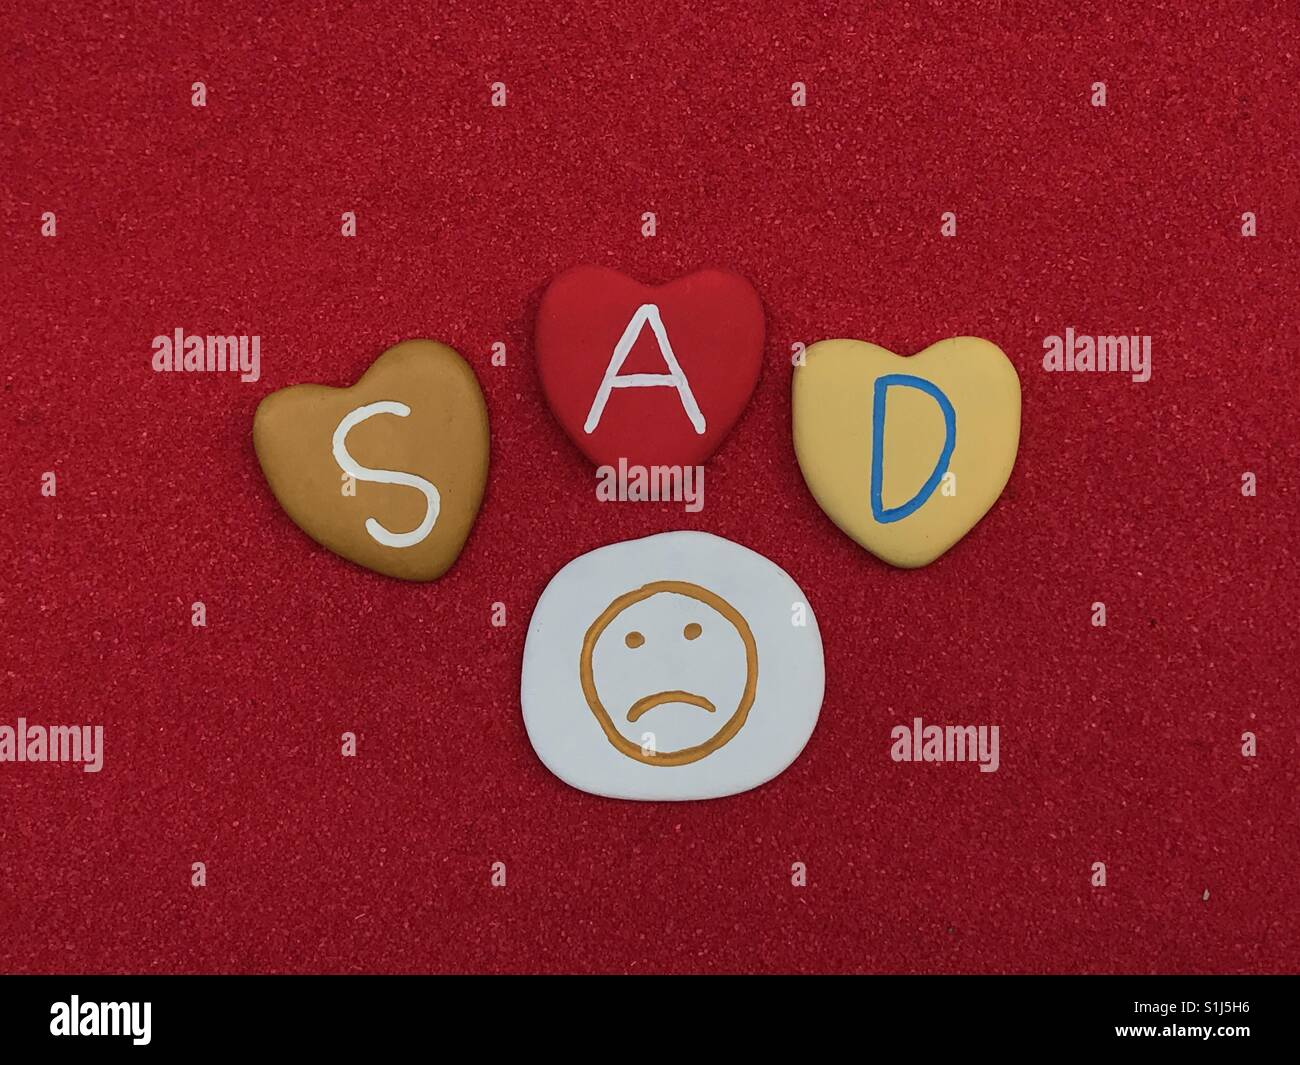 Sad Stock Photo